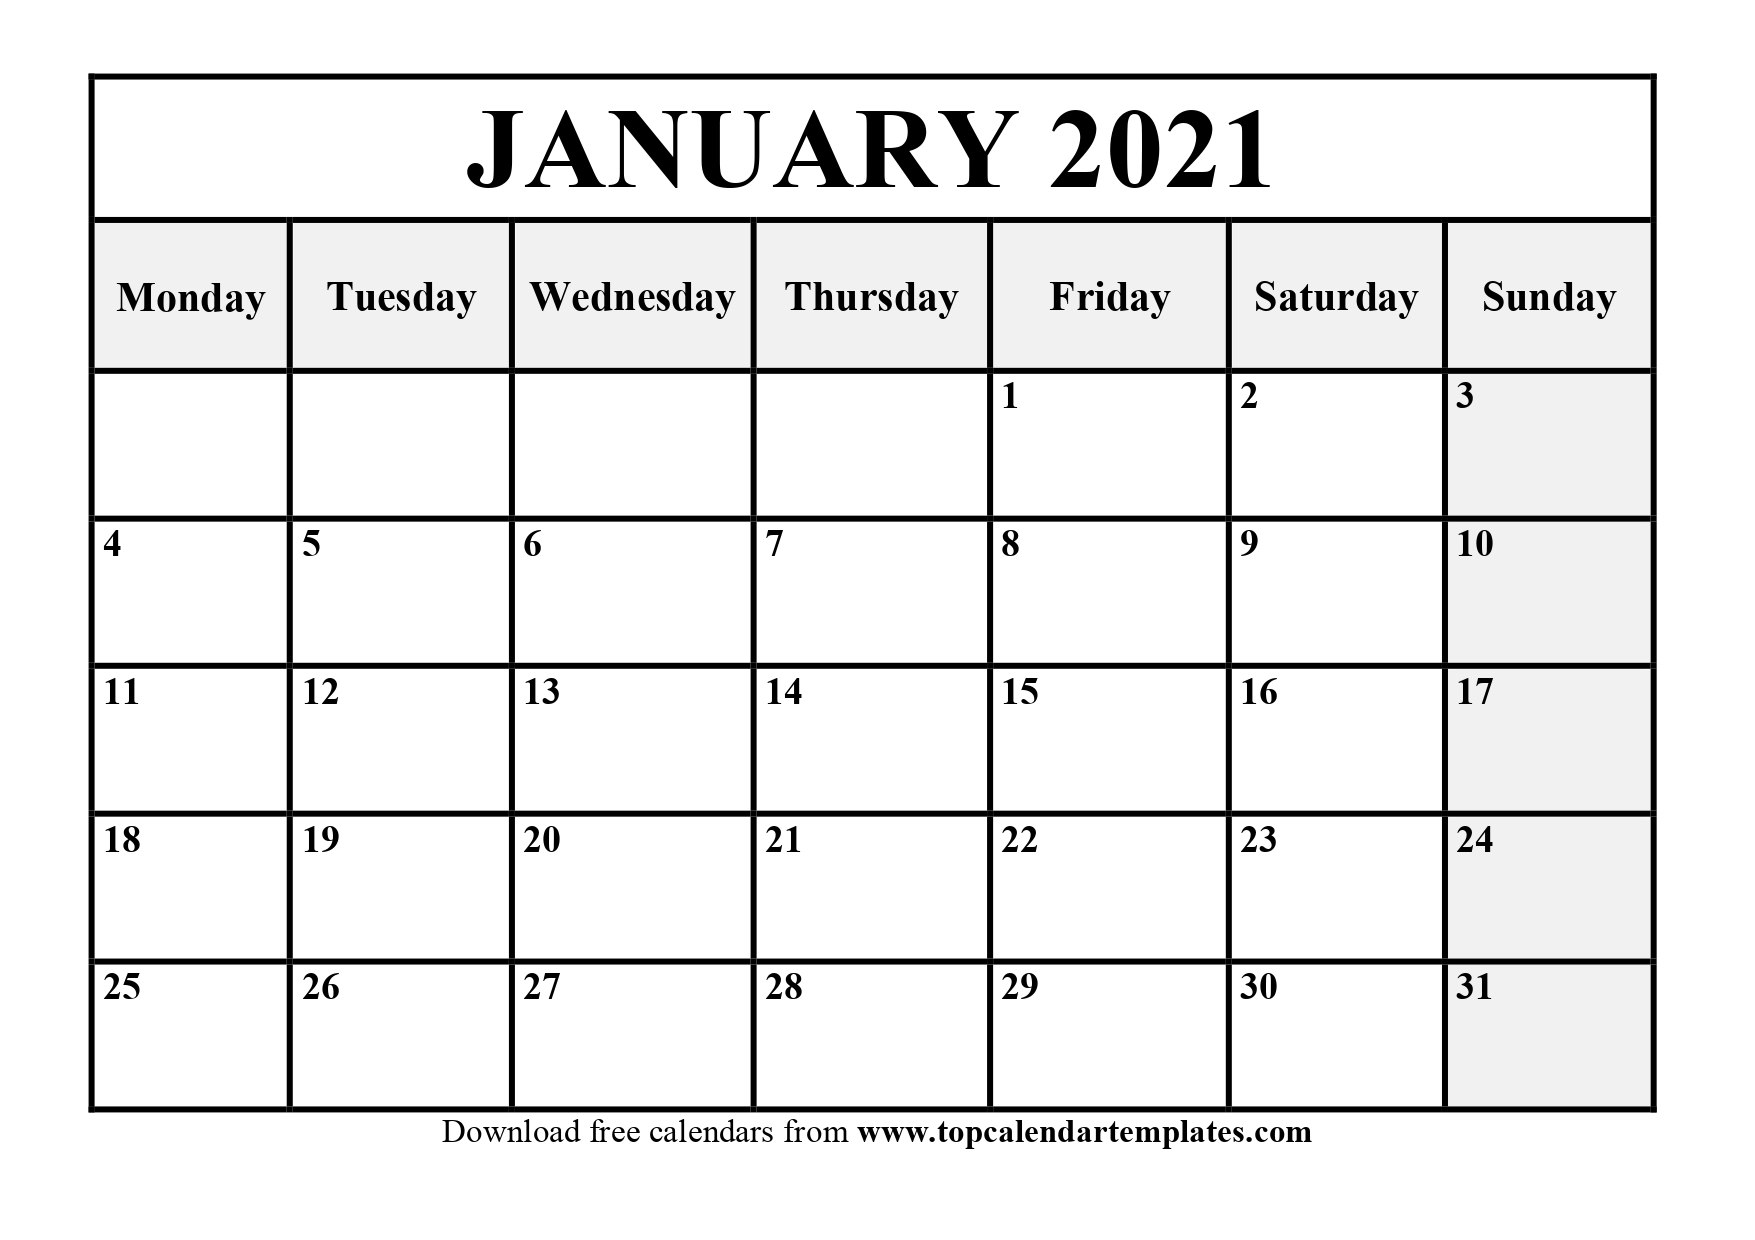 Free January 2021 Calendar Printable Pdf Word 1